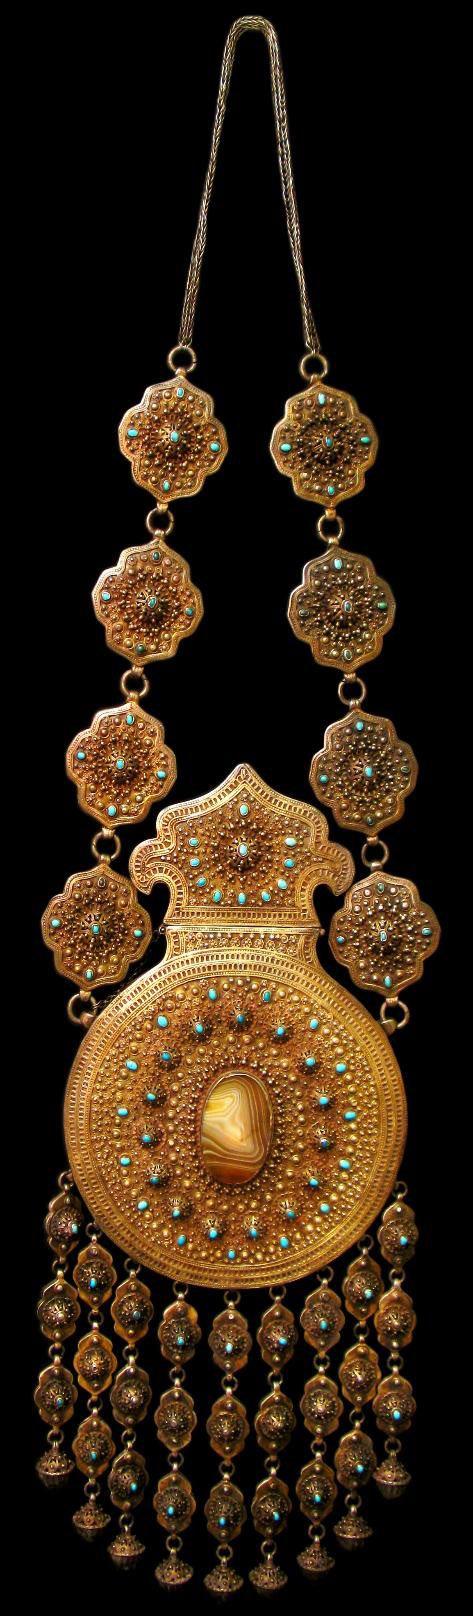 Uzbekistan   Rare Silver Gilt, Turquoise & Agate Equestrian Koranic Amulet Case   19th century, Emirate of Bukhara   Sold